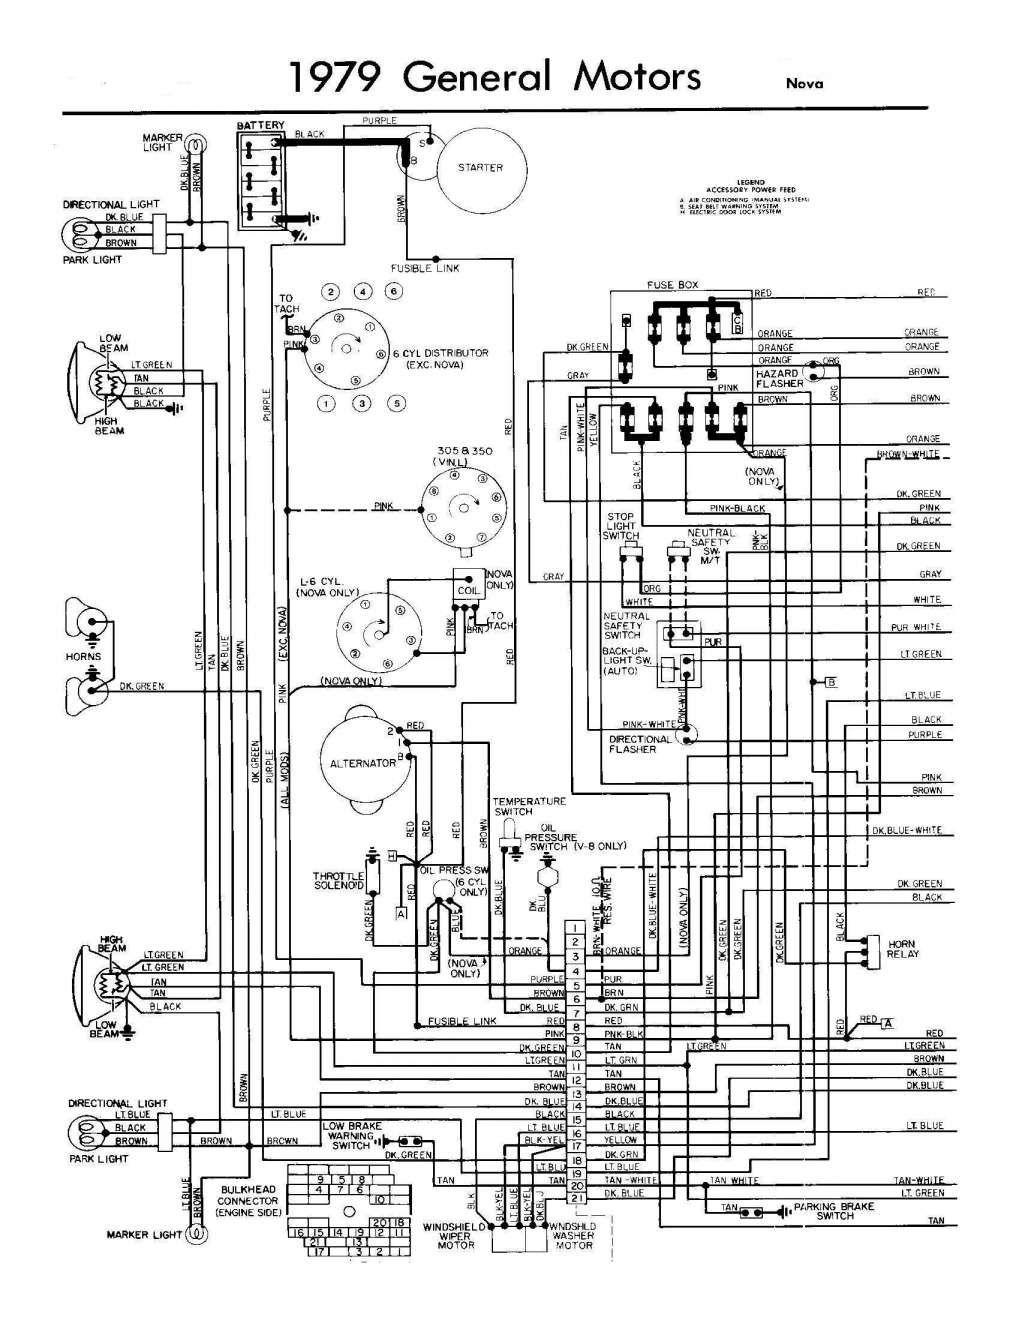 17 Fuse Diagram 1991 Subaru Mini Truck Sambar Truck Diagram In